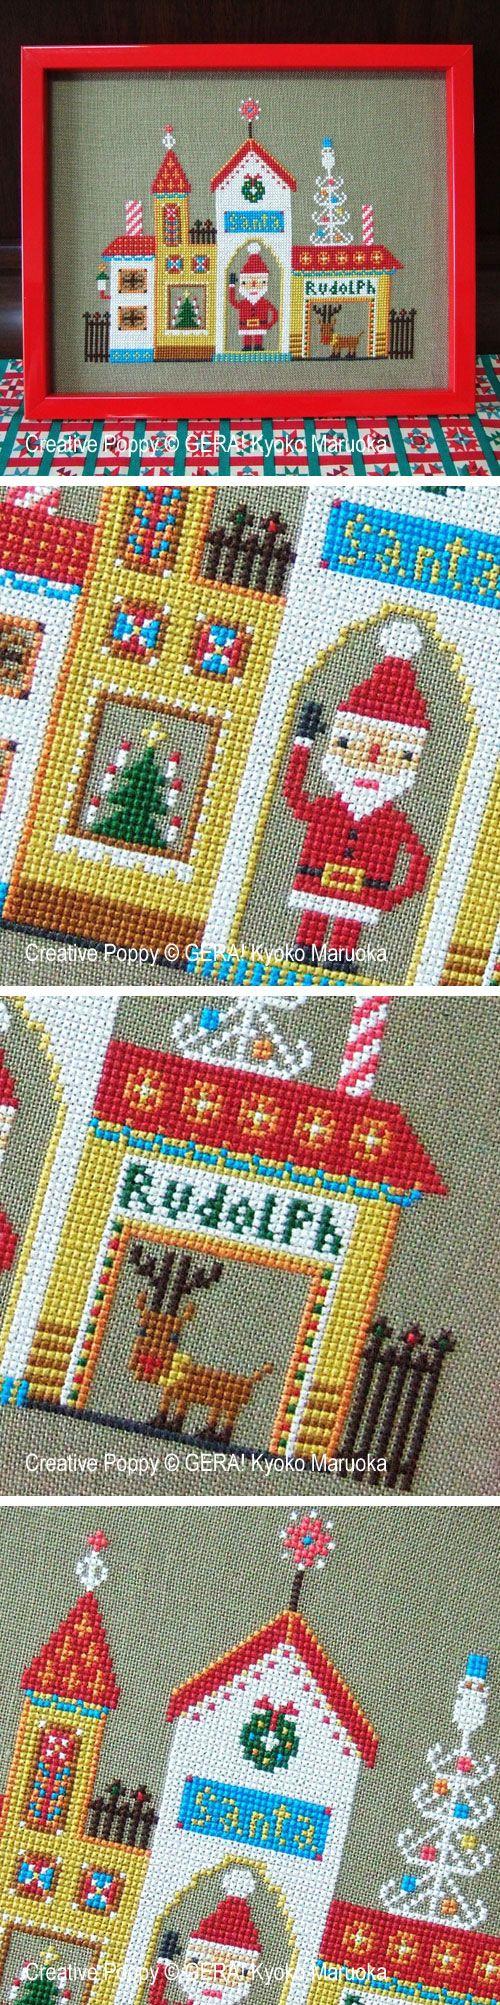 Adorable Christmas cross stitch pattern by Japanese designer Gera! #crossstitch #diychristmas #handmadeholiday